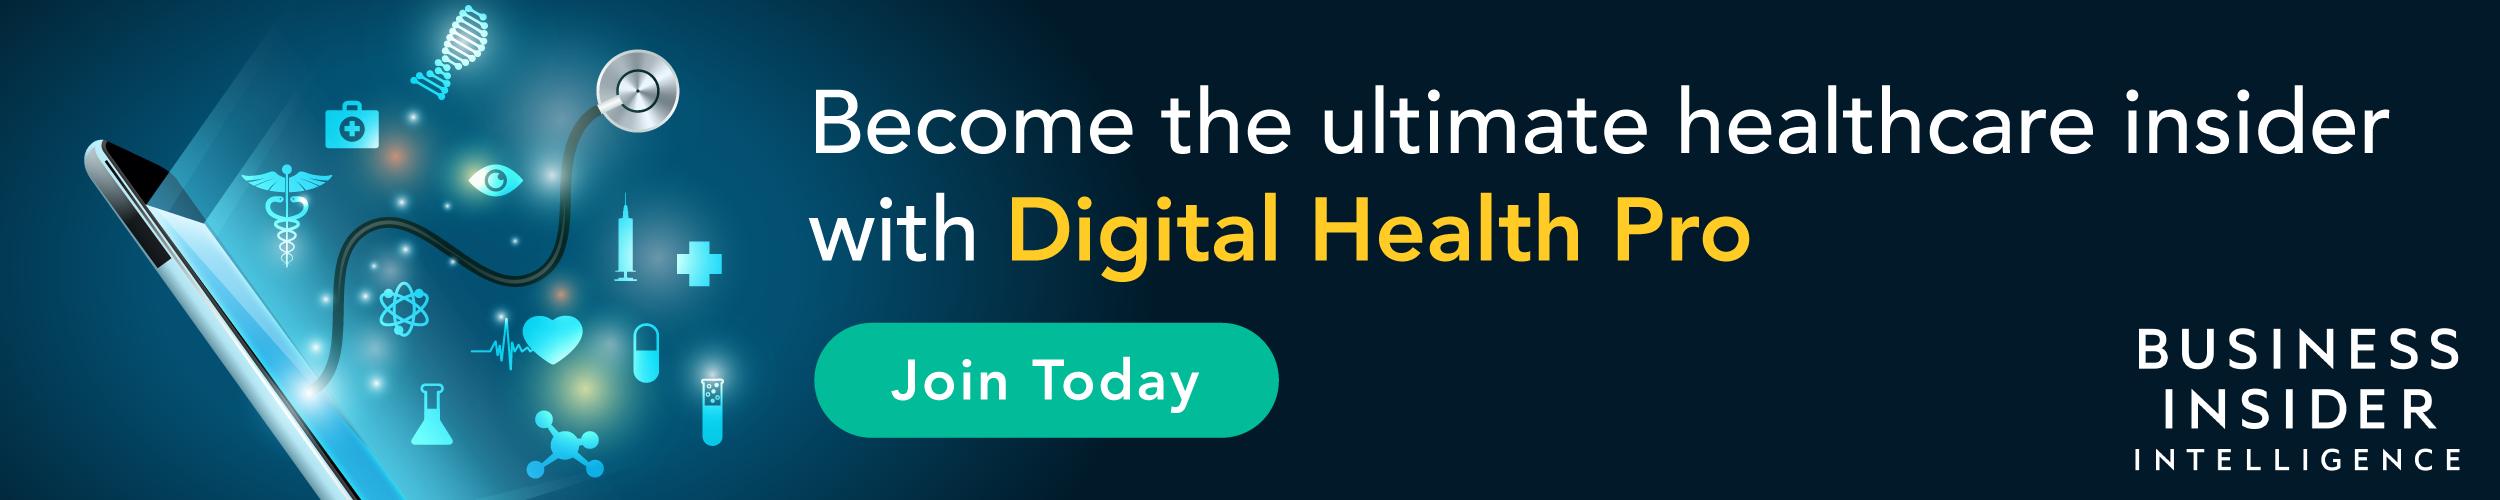 Digital Health Pro